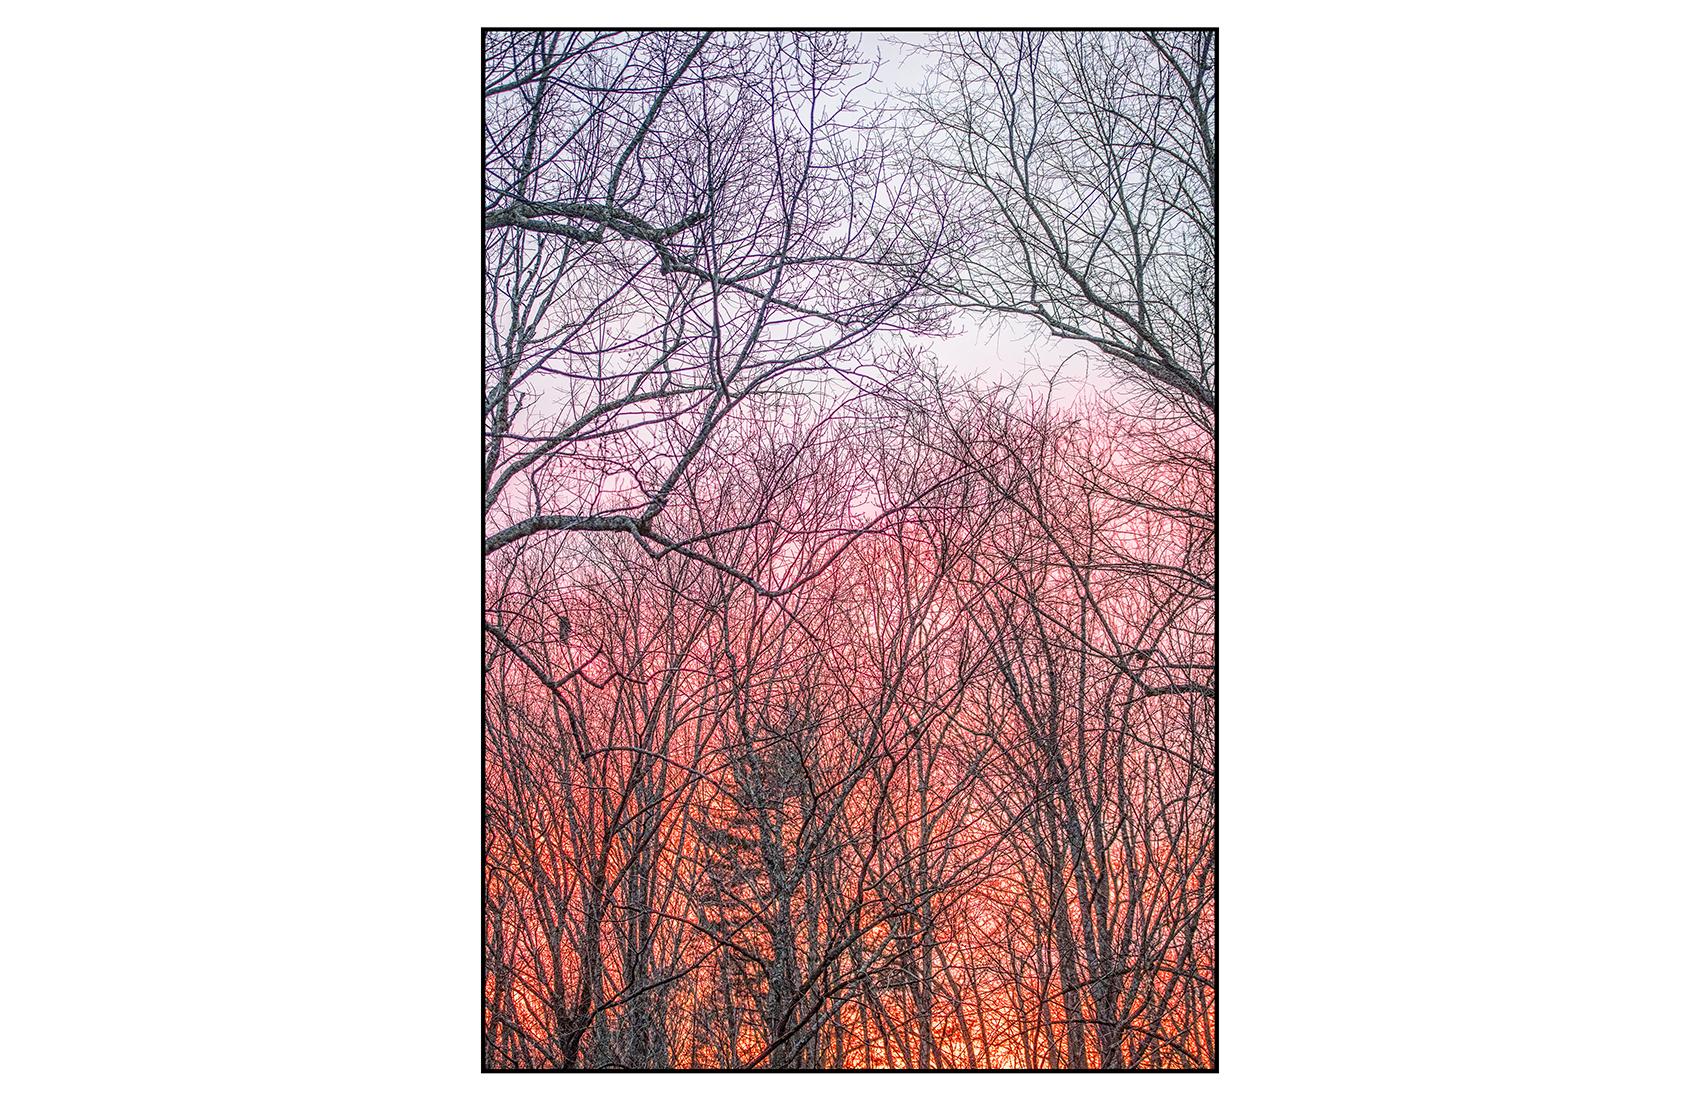 AppalachianForest21